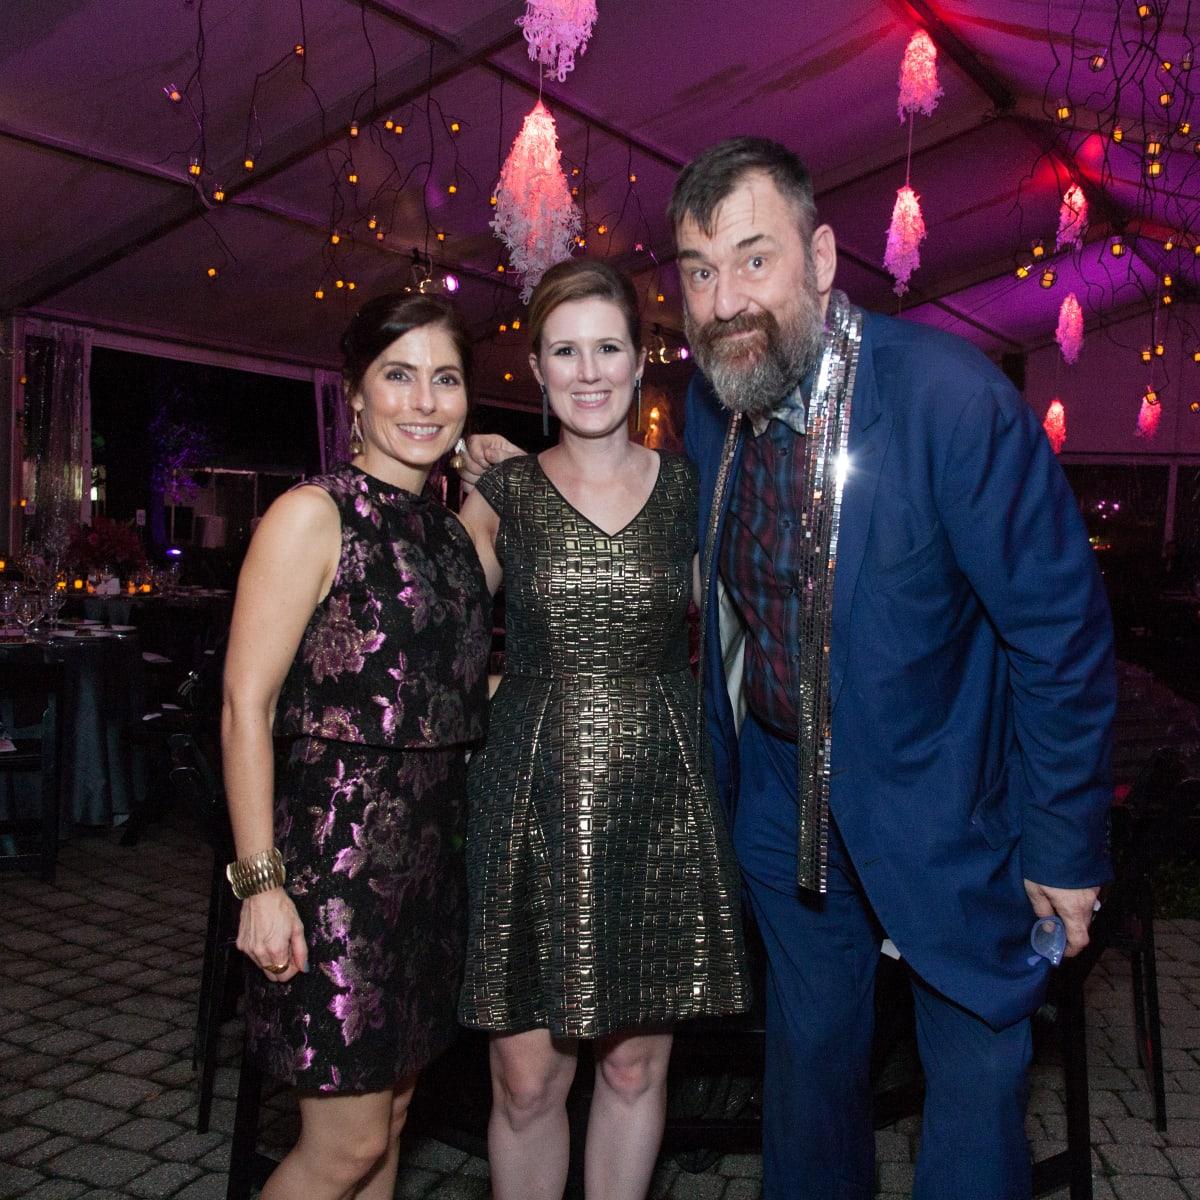 News, Shelby, CAMH Another Great Night, Nov. 2015, Amber Winsor, Amanda Bredbenner, Bill Arning